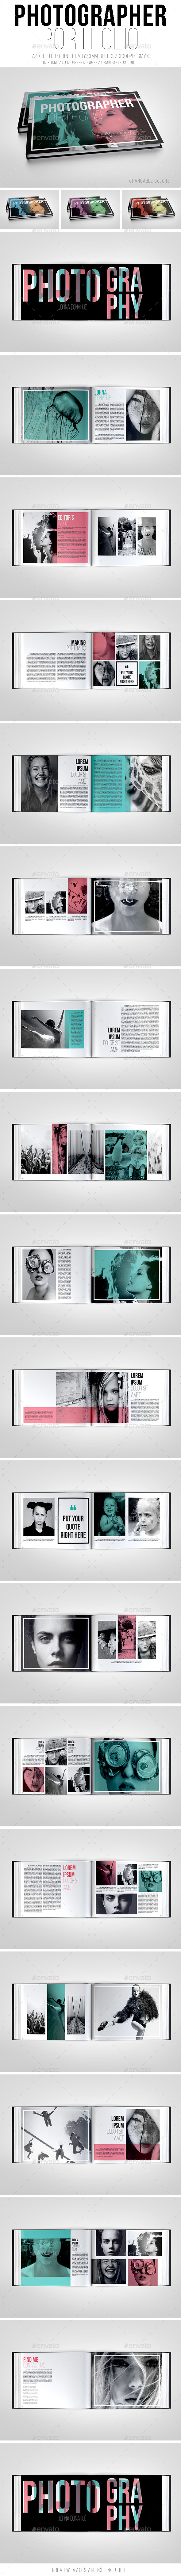 Photographer Portfolio Brochure - Portfolio Brochures